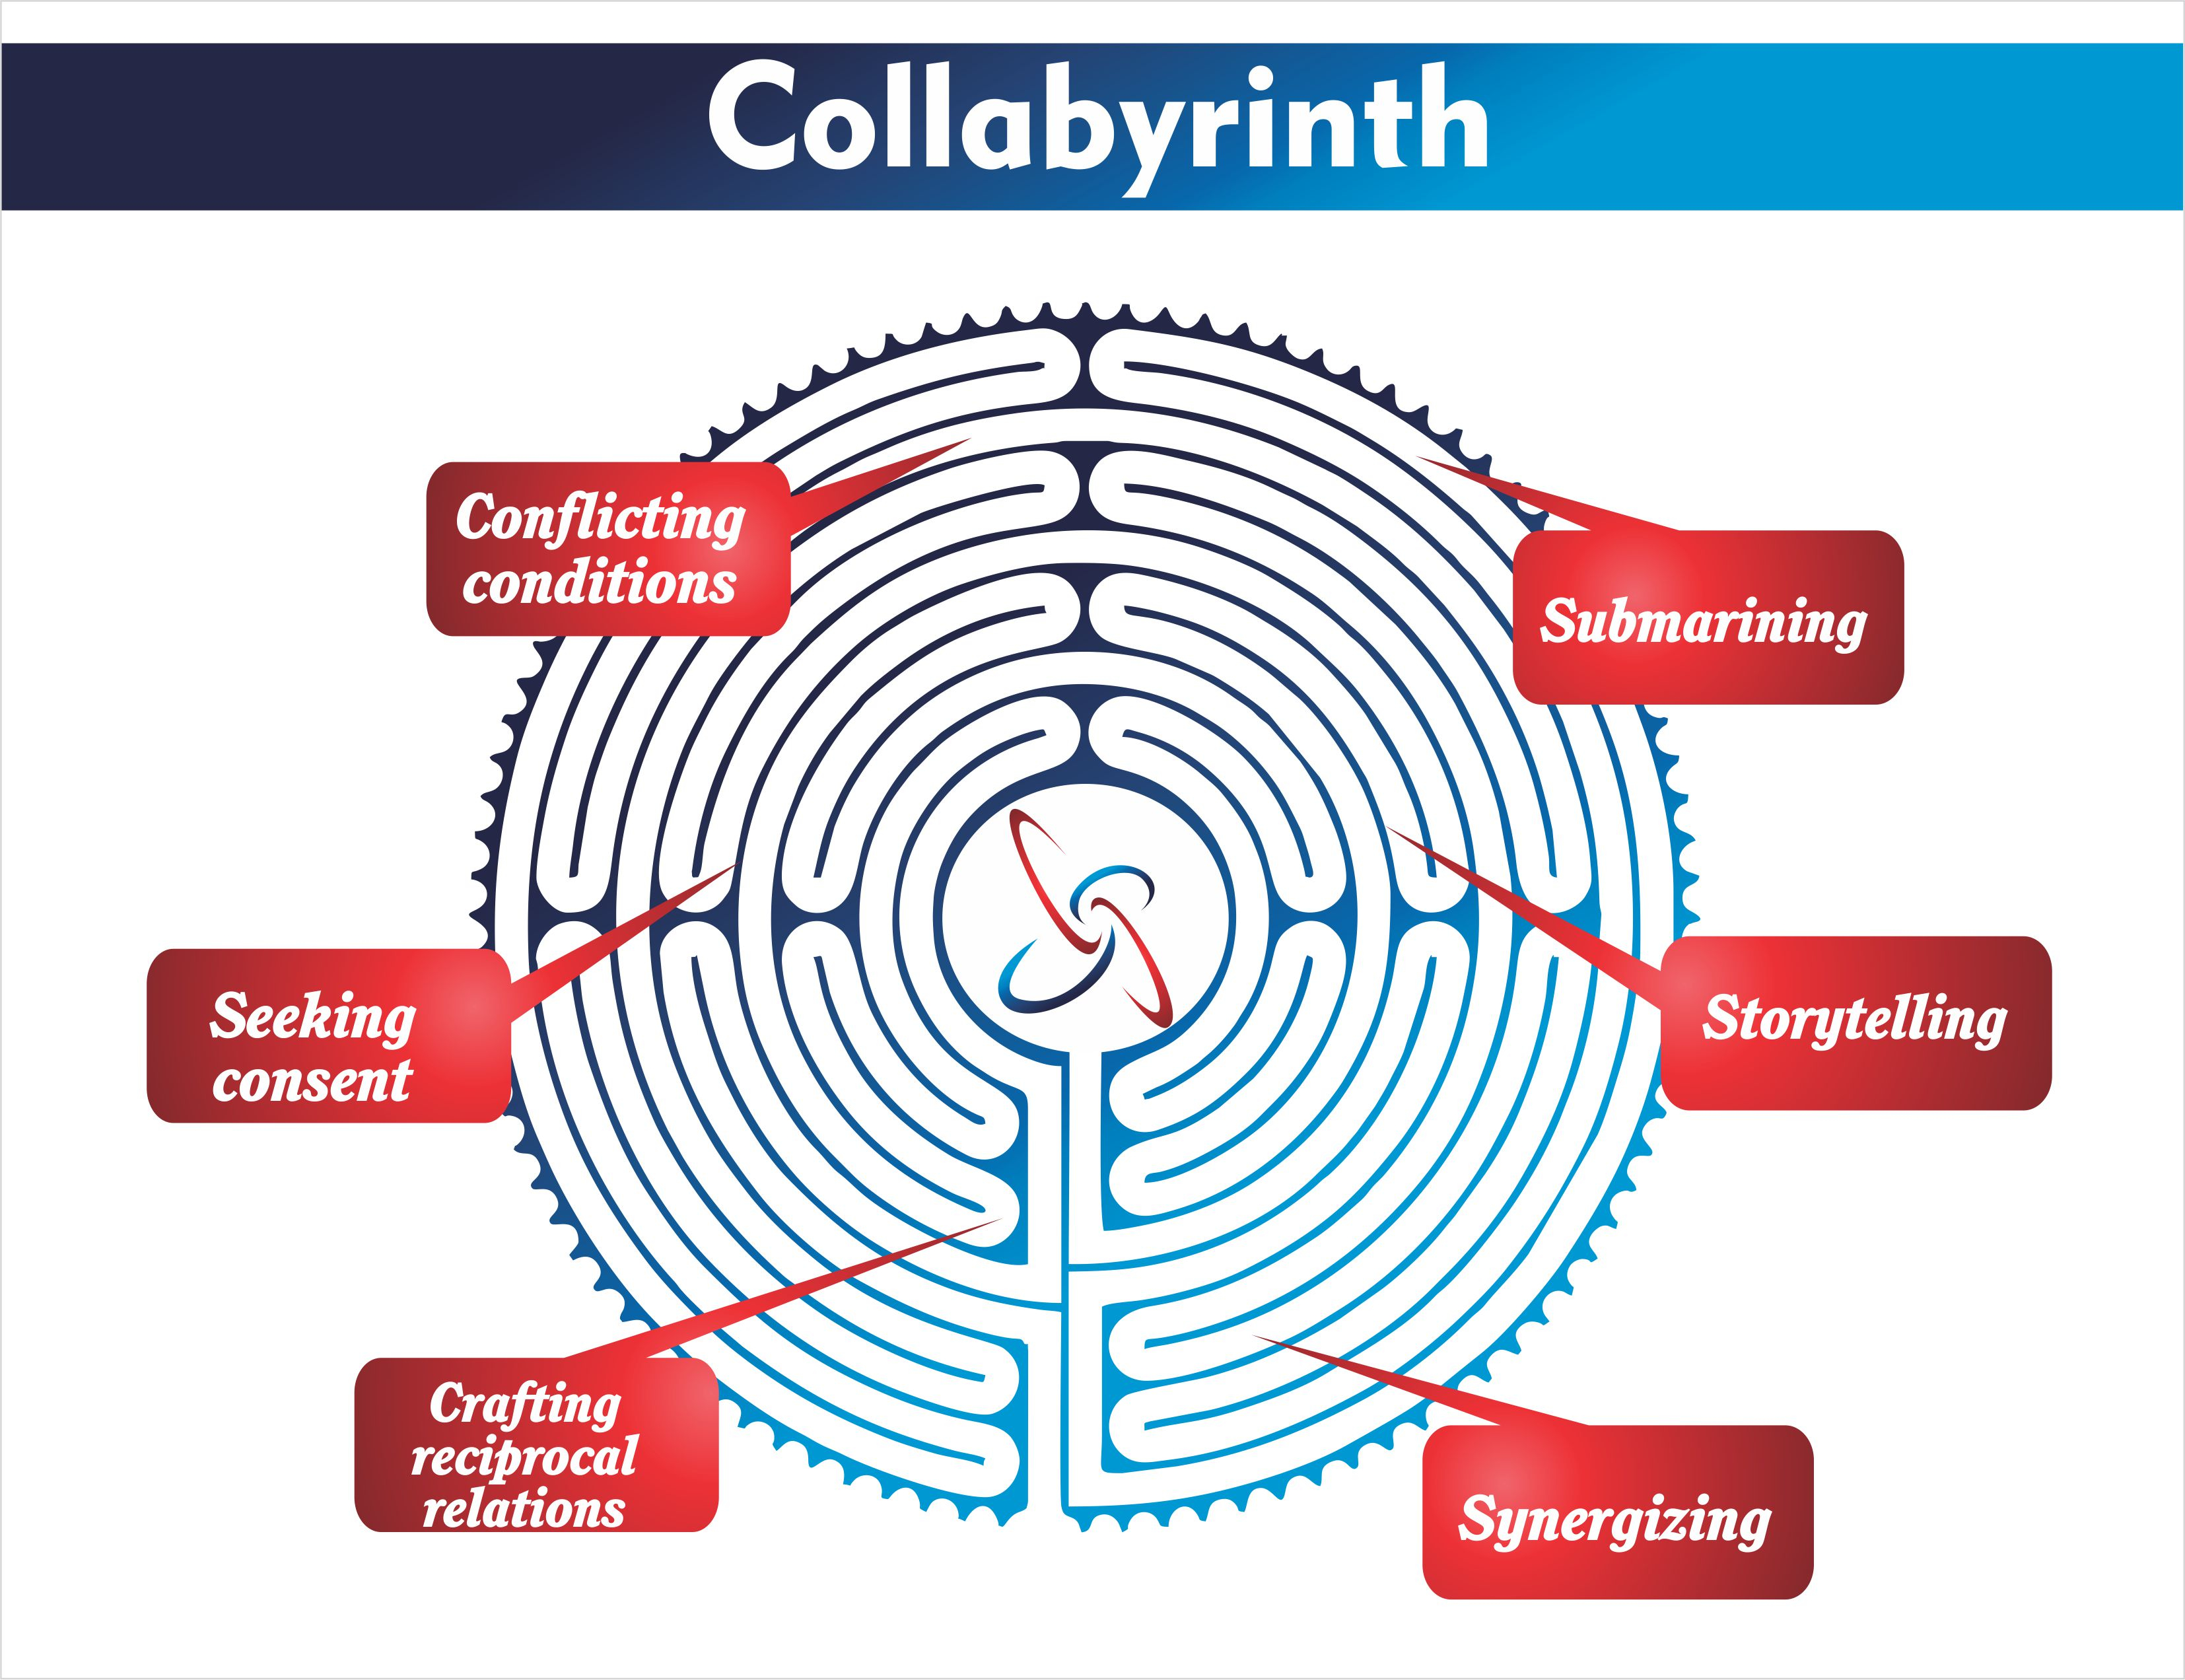 Collabyrinth